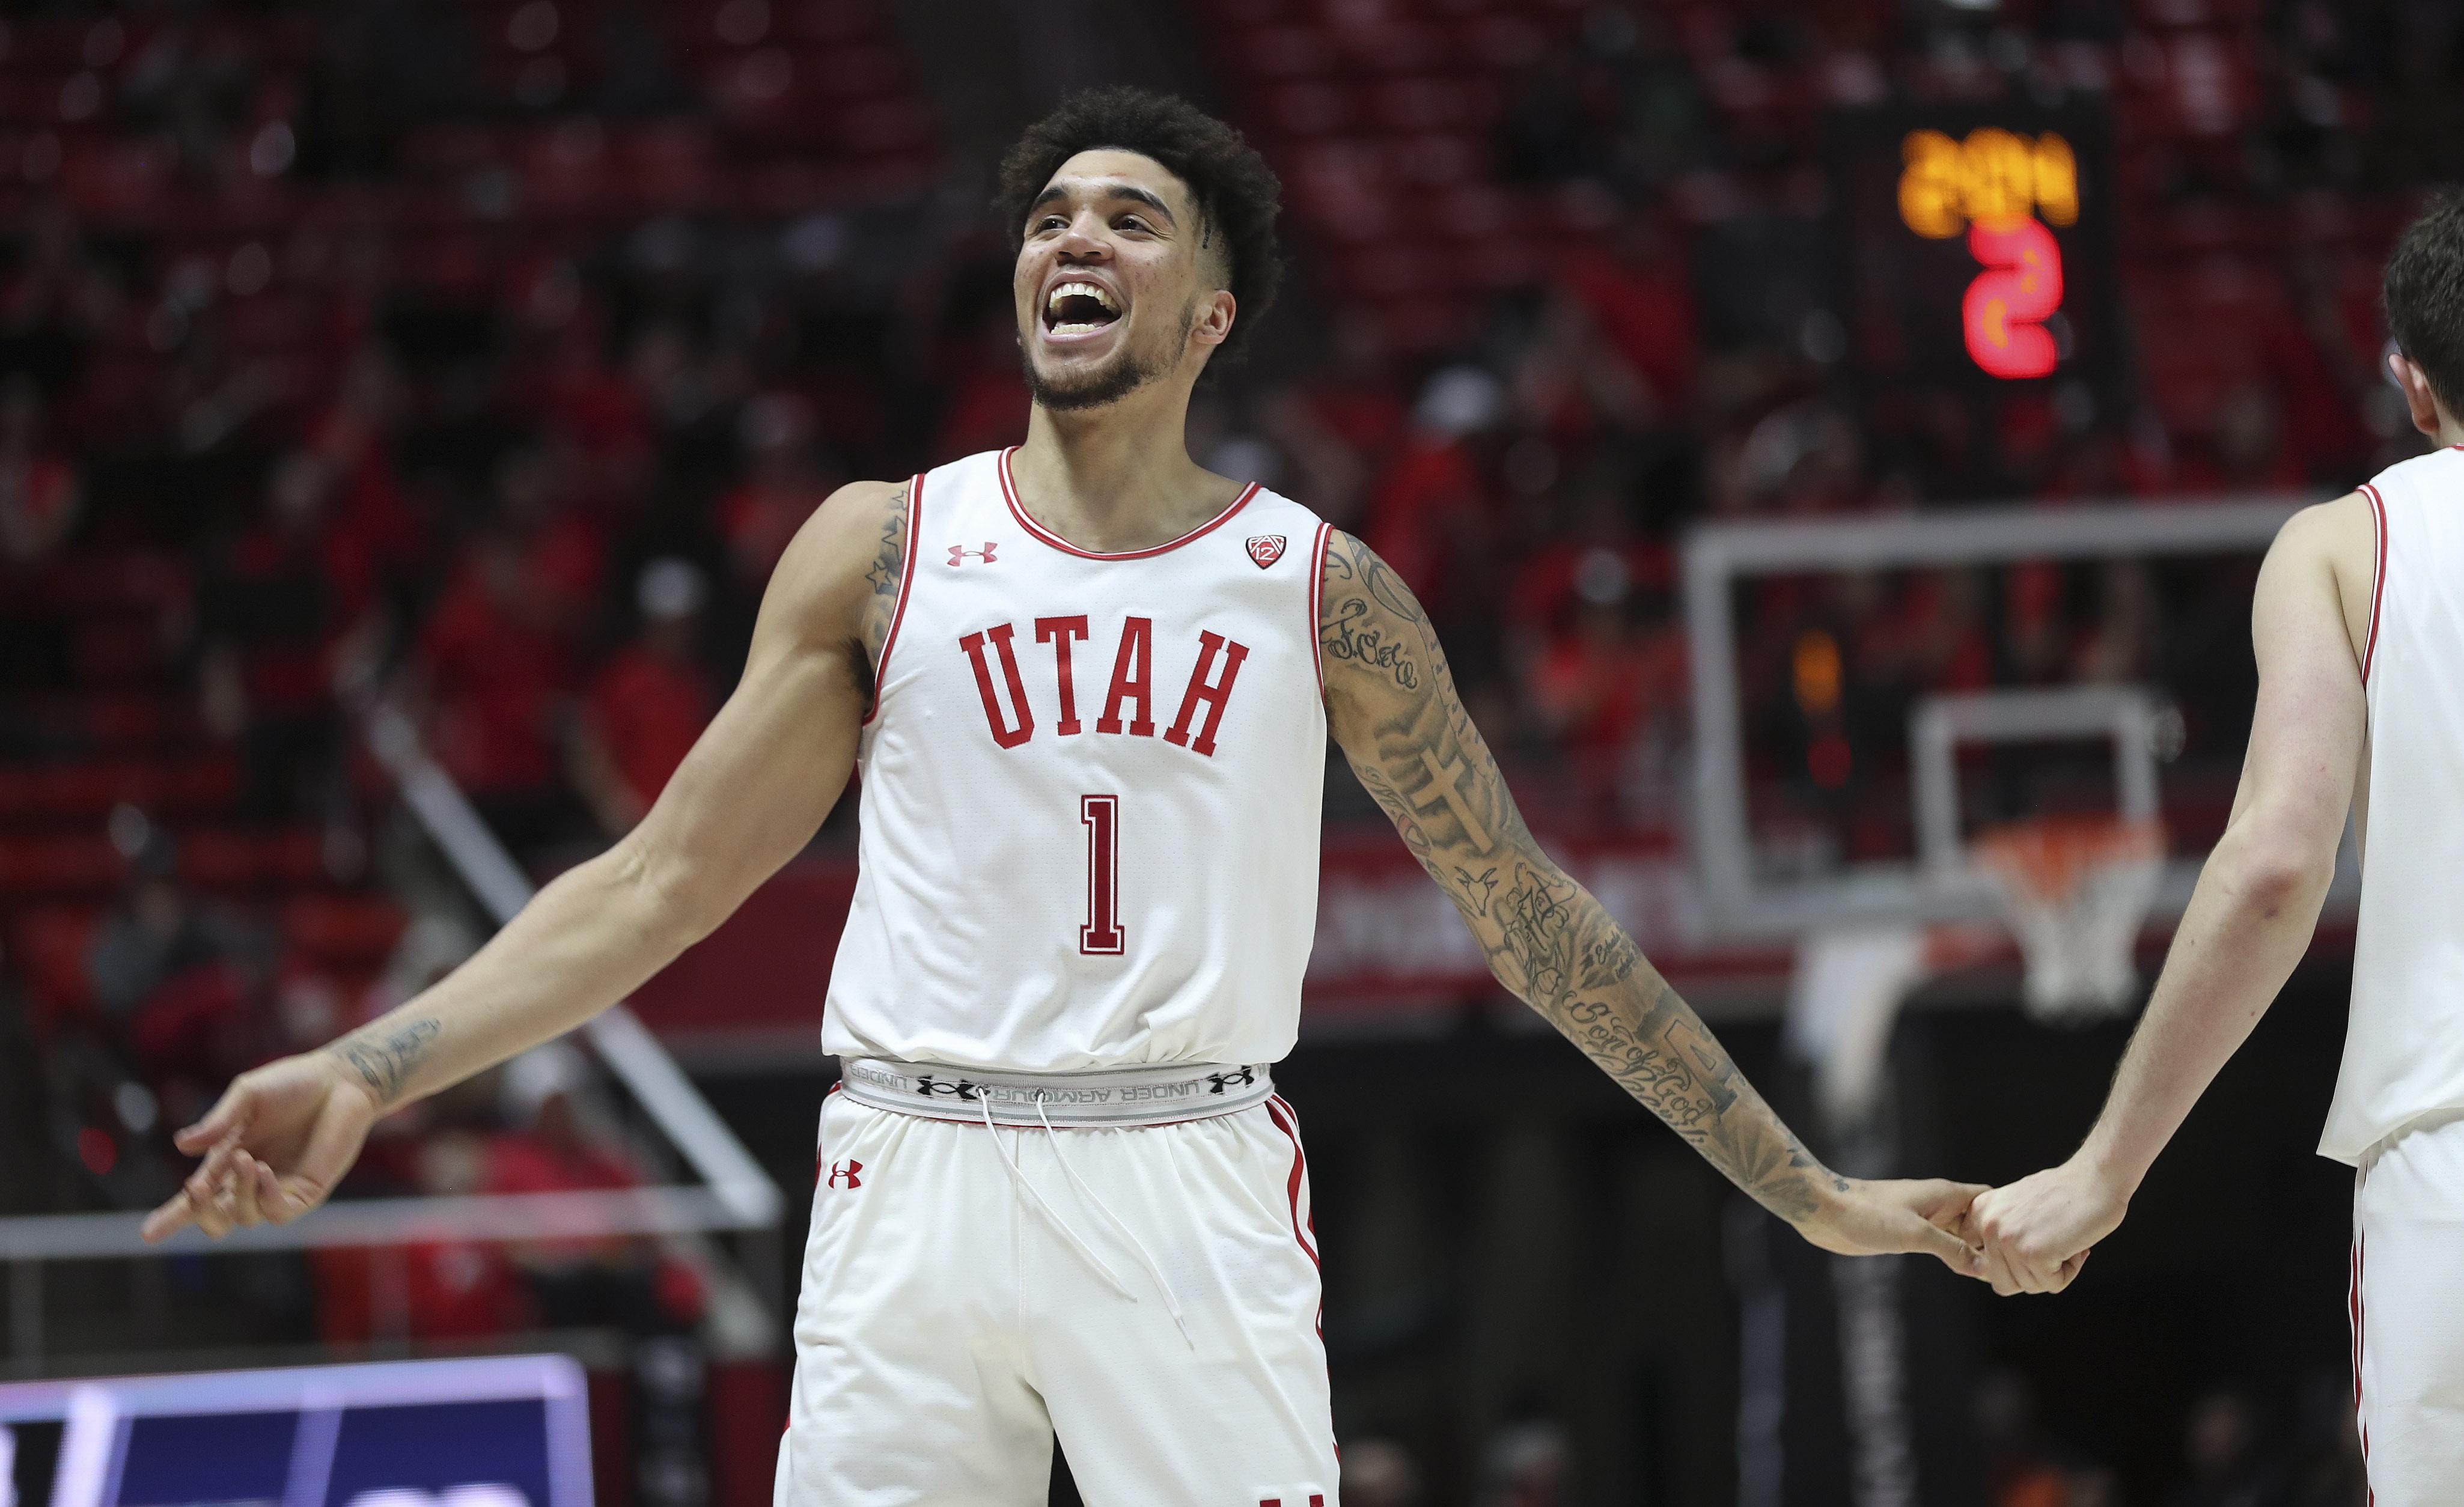 Utah Utes forward Timmy Allen (1) celebrates a basket near the end of the game with the Washington Huskies in Salt Lake City on Thursday, Jan. 23, 2020. The Utes won 67-66.